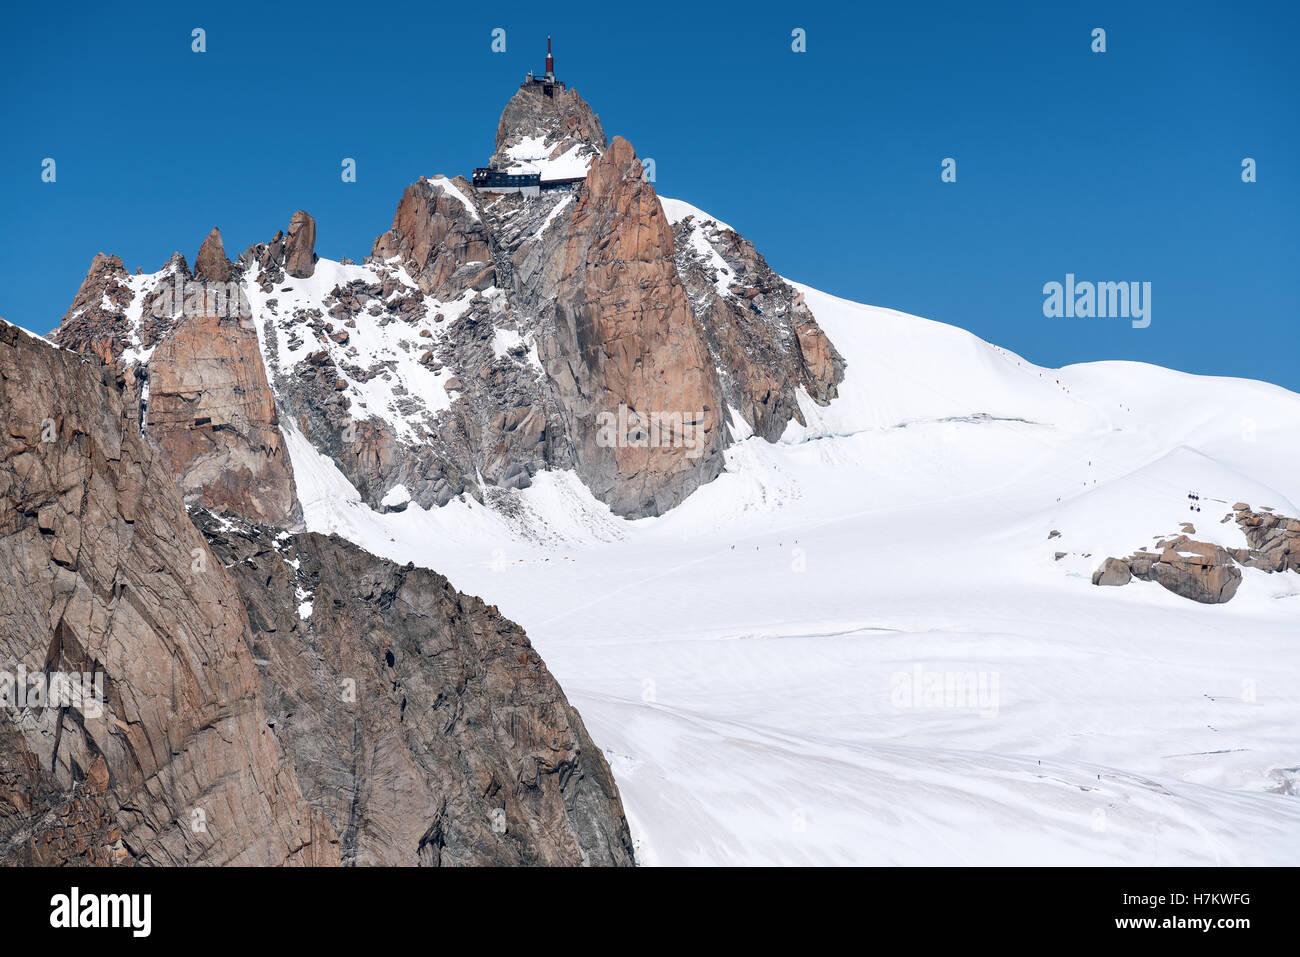 Aiguille du Midi seen from Italian side of the Alps, Courmayeur, Italy, Alps, Europe, EU - Stock Image